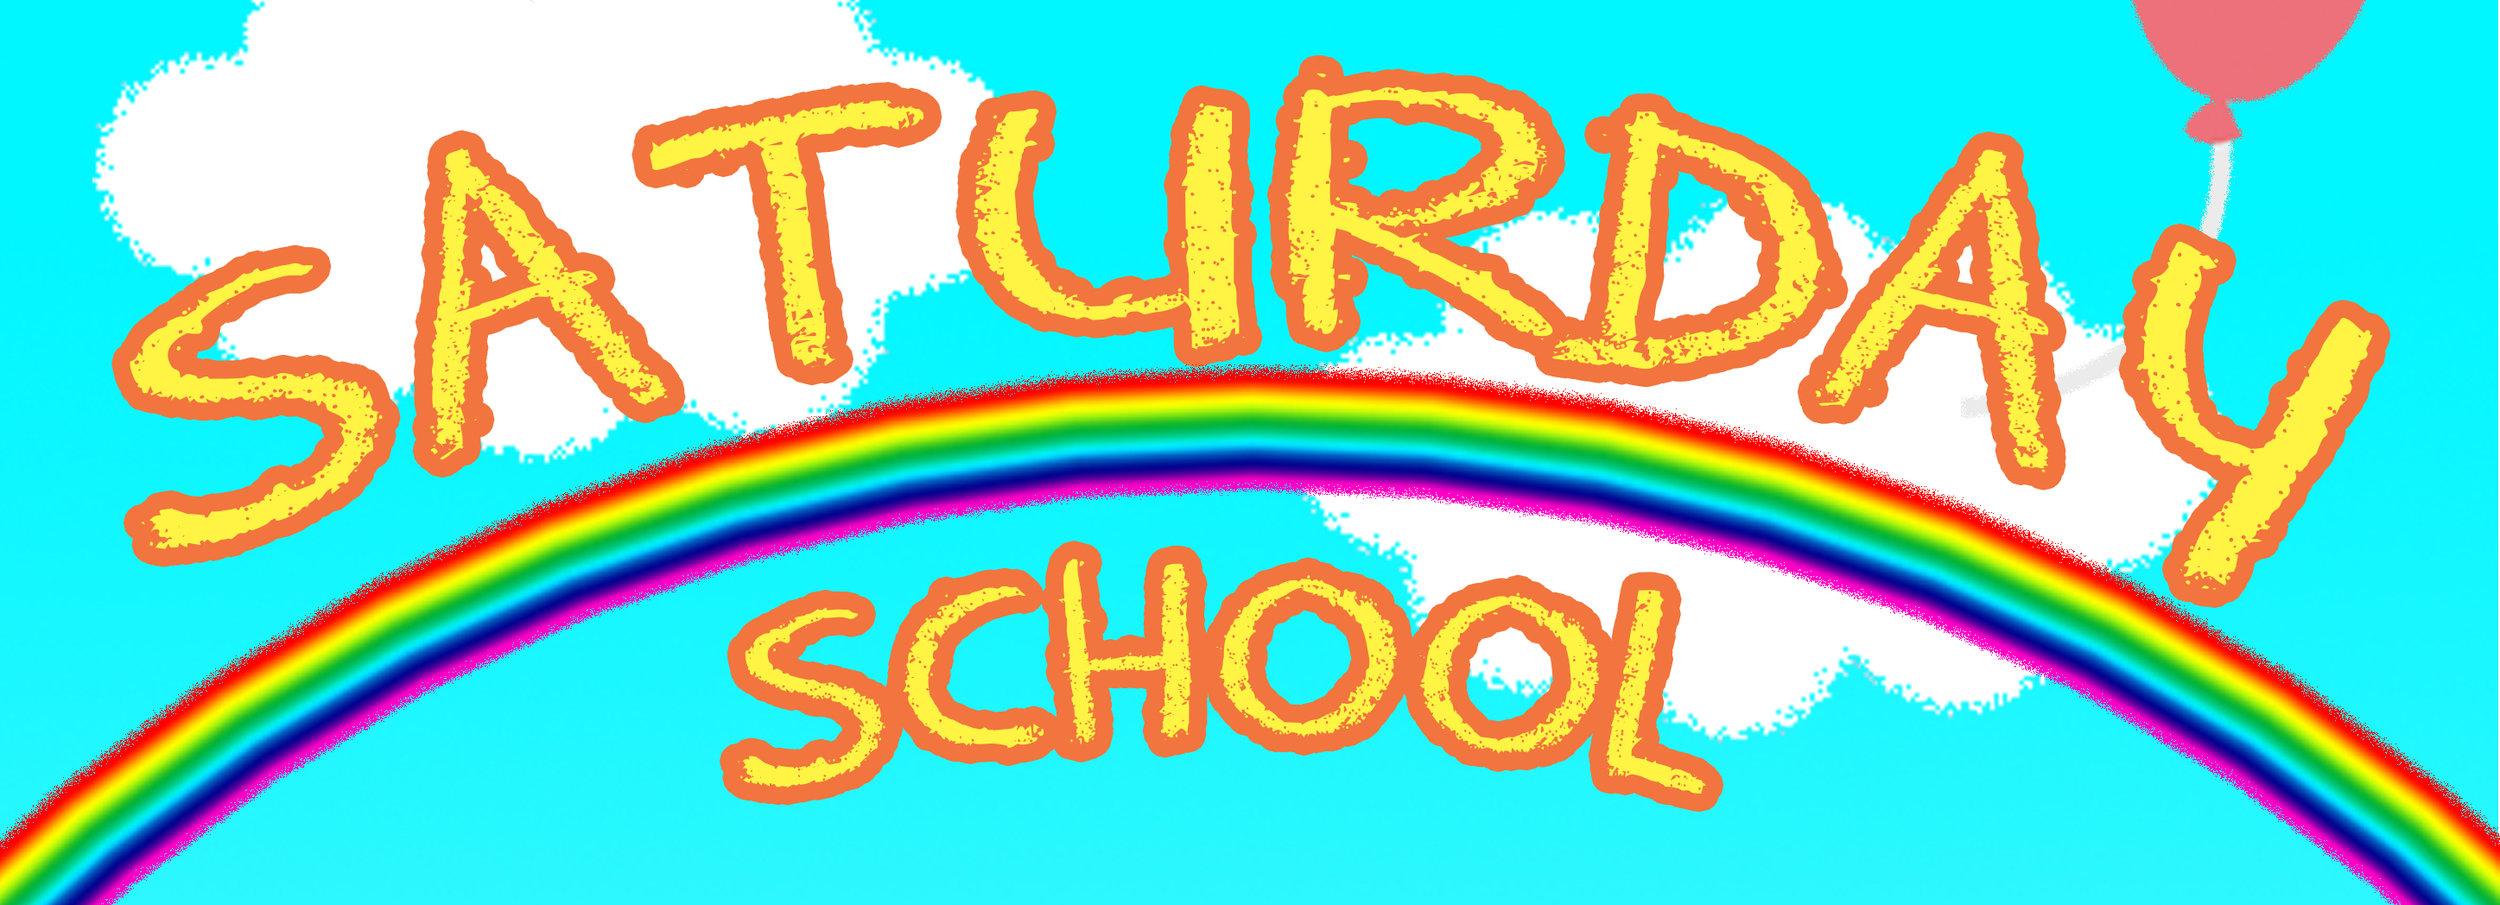 saturday school banner.jpg